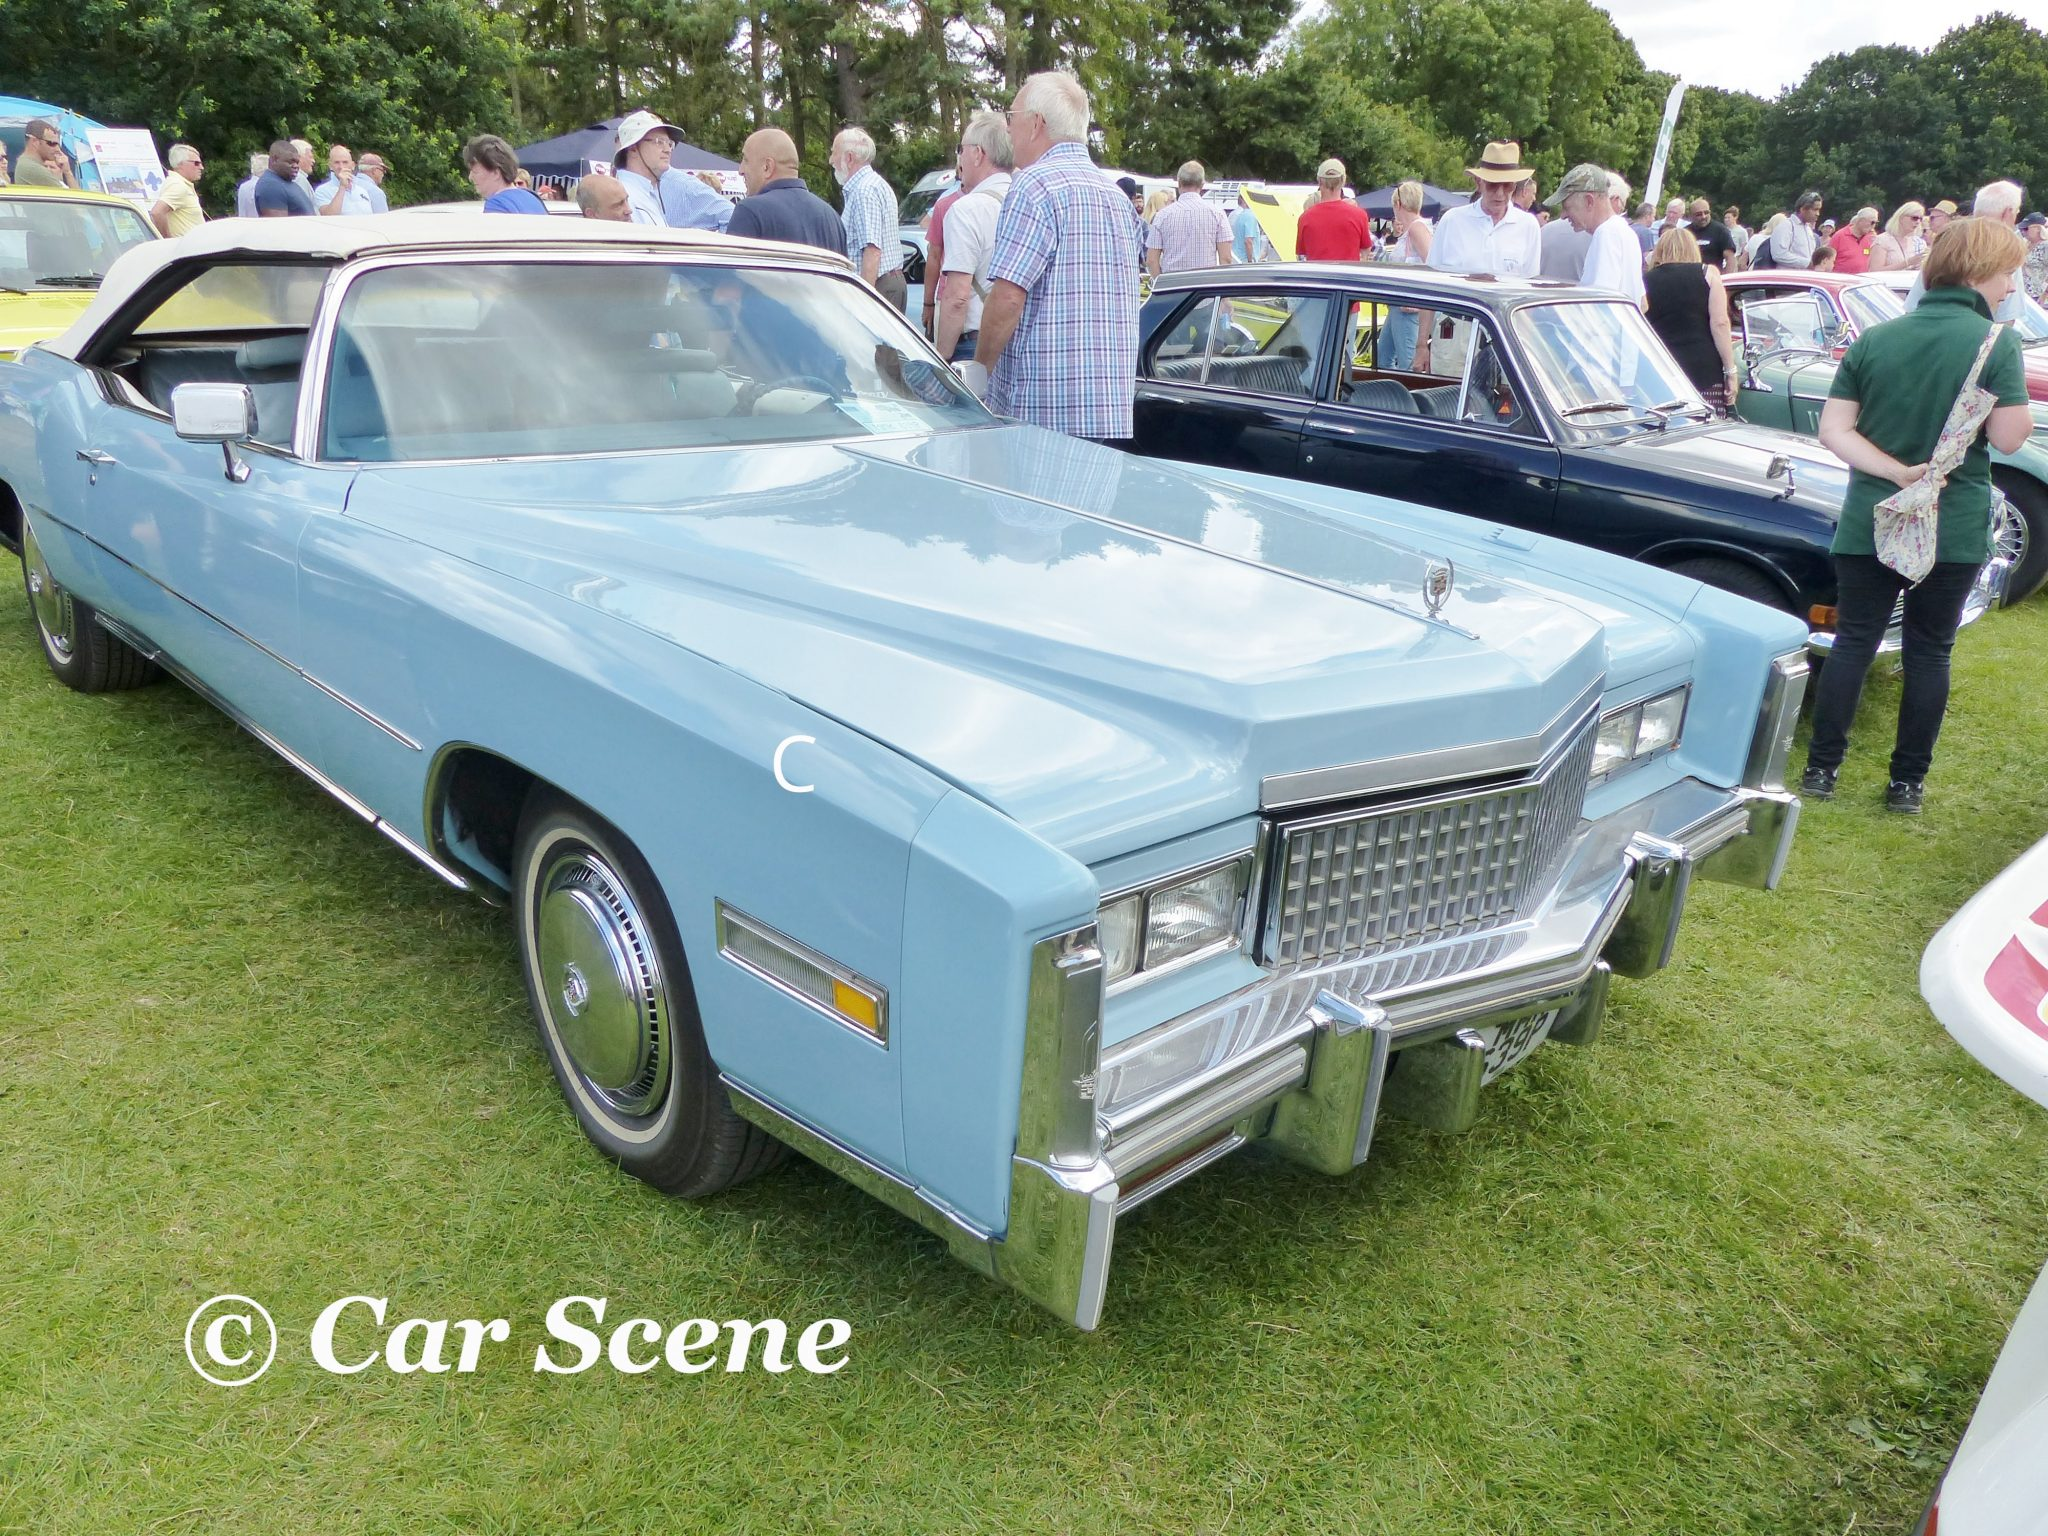 1975 Cadillac Eldorado front three quarters view